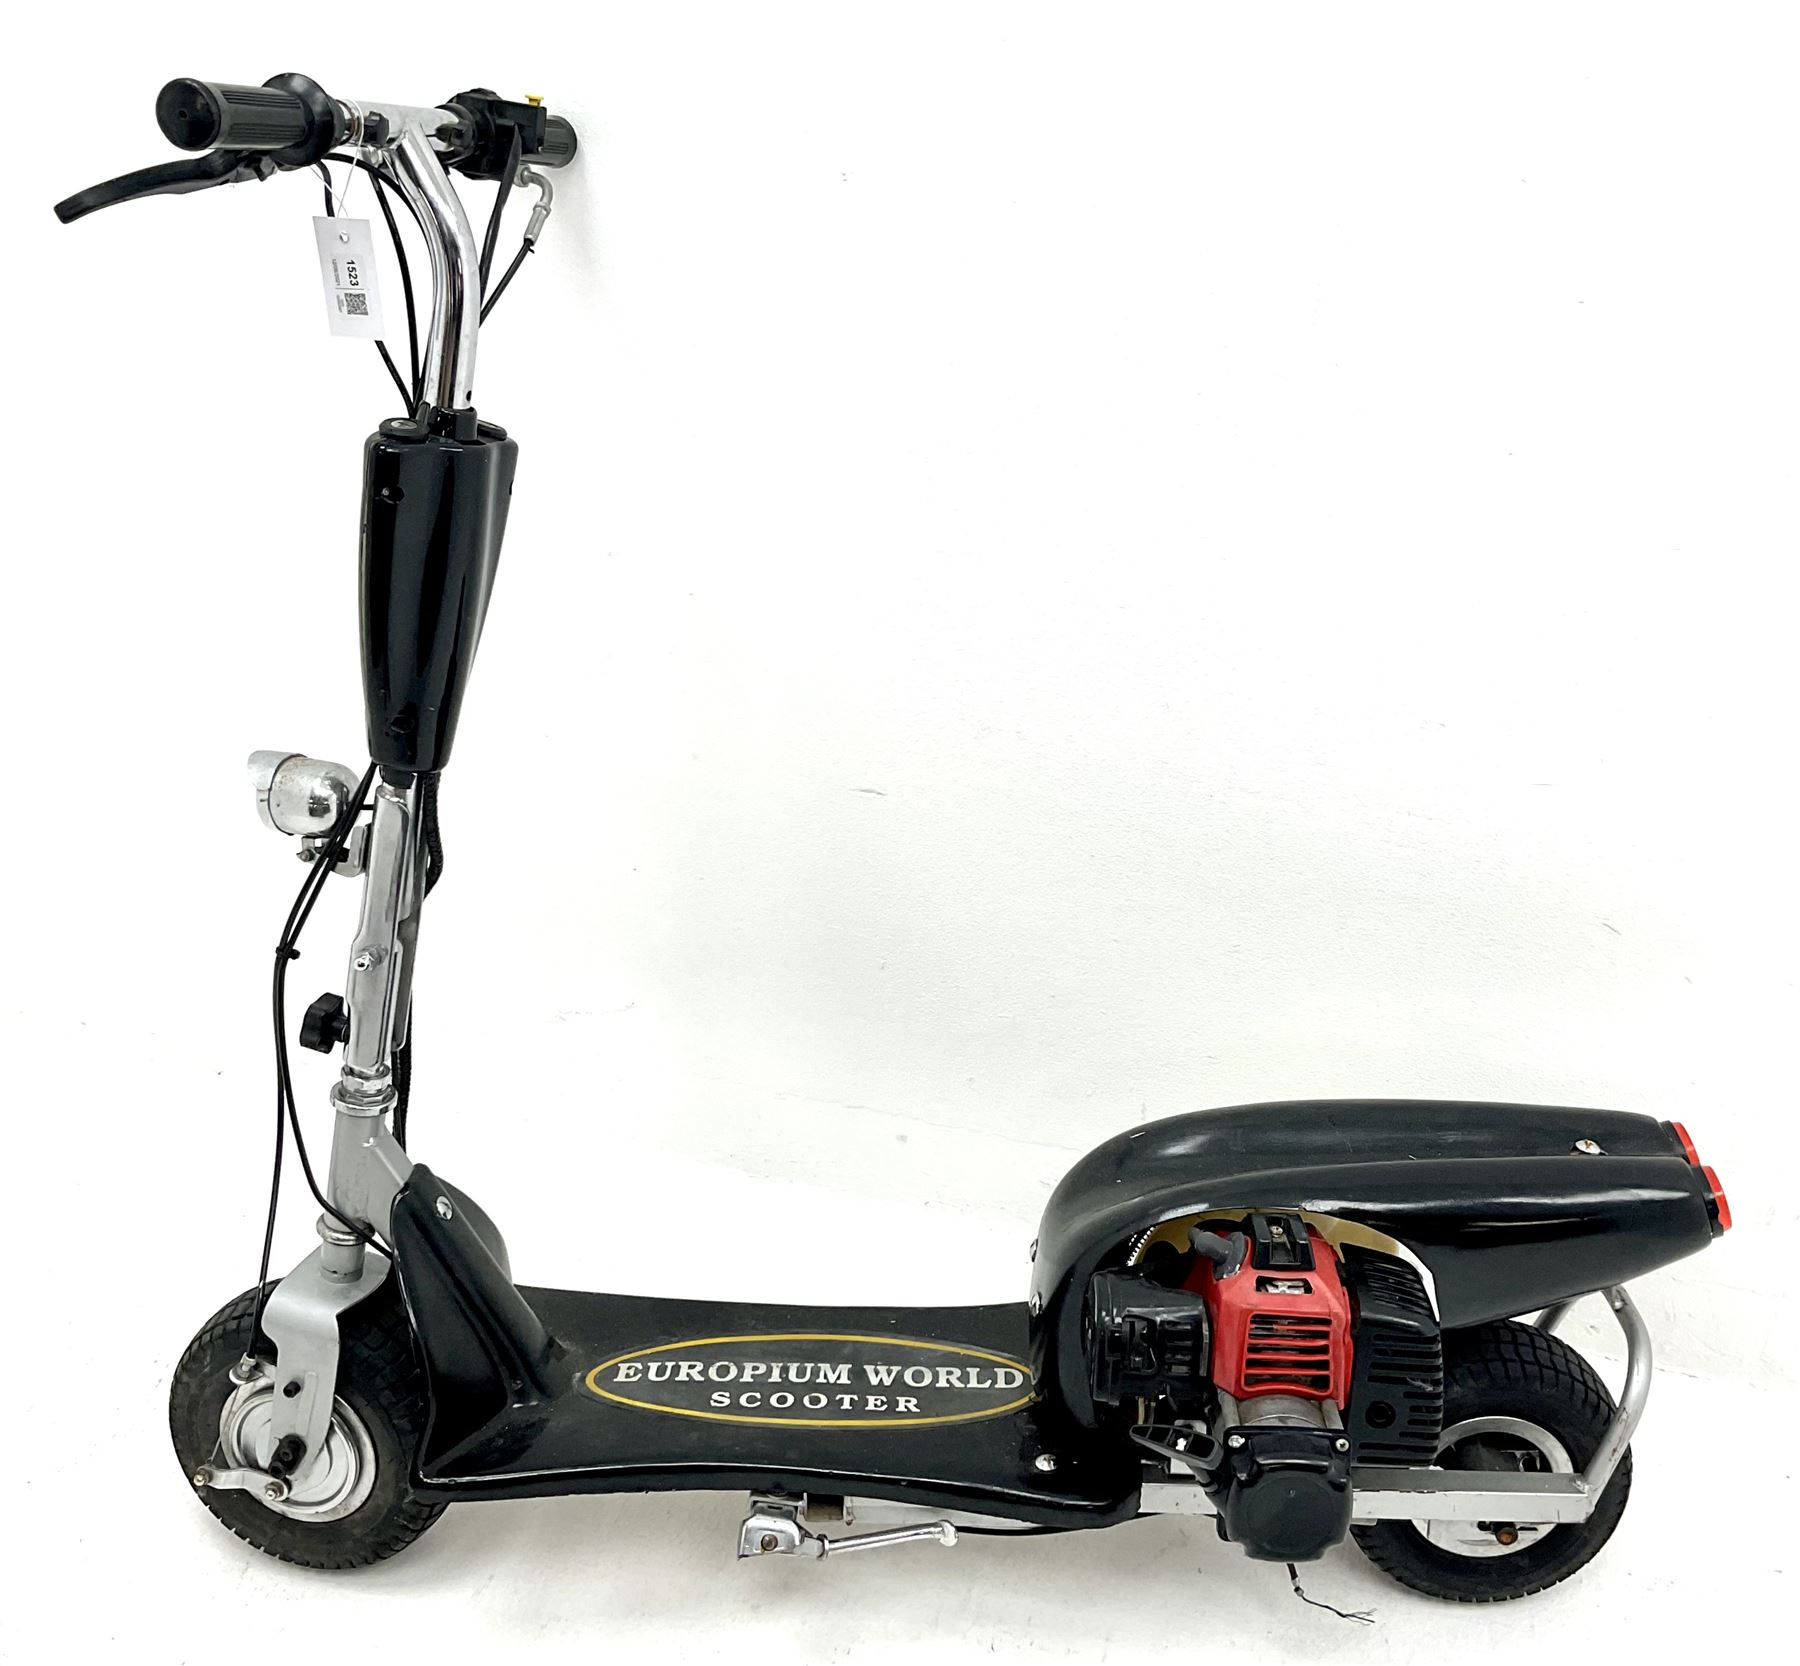 Emporium World Scooter